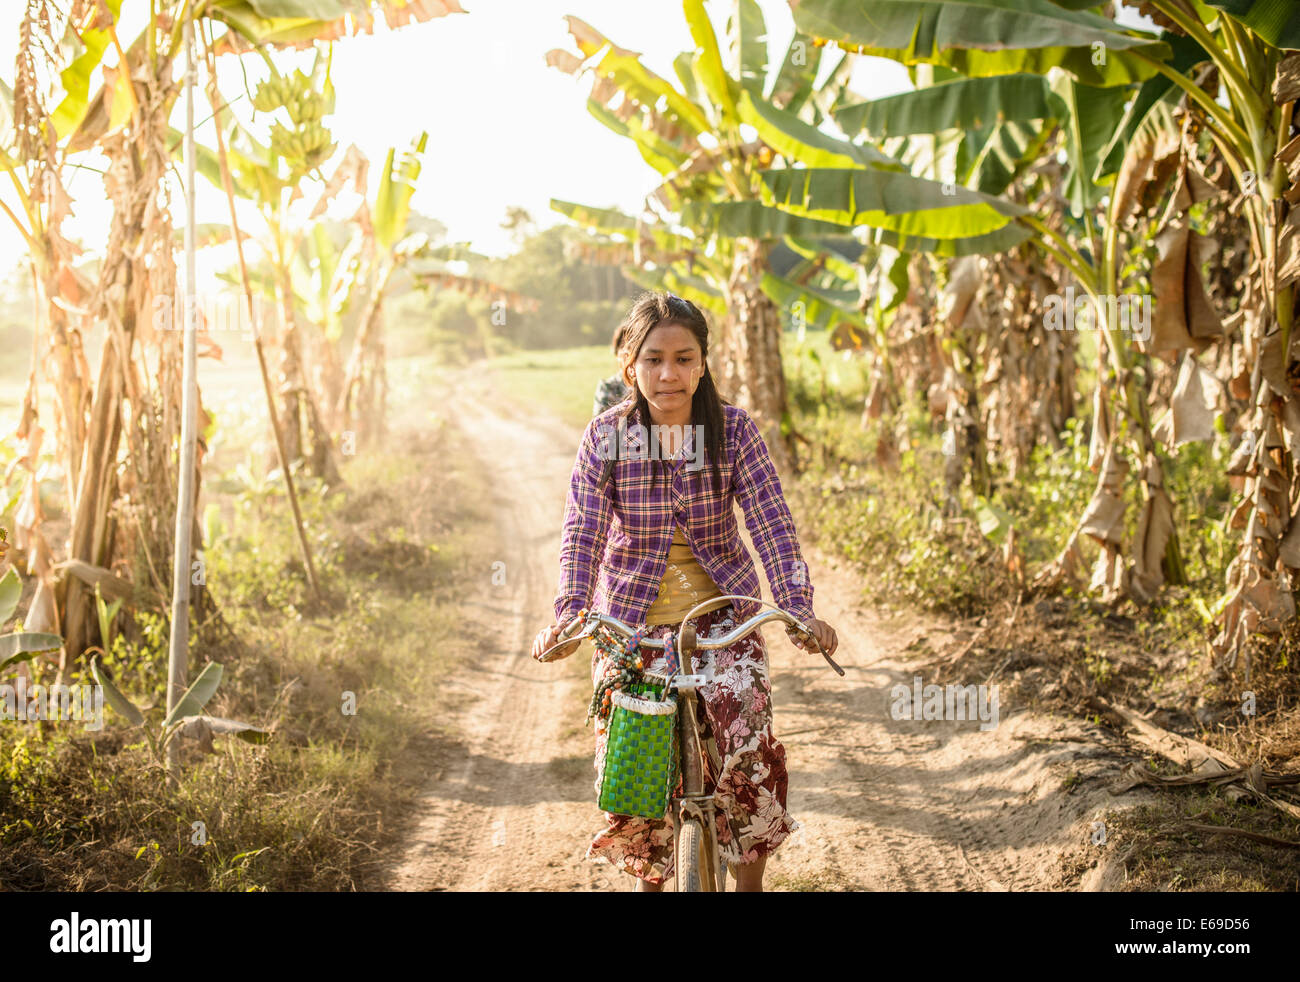 Donna asiatica equitazione bicicletta su strada rurale Foto Stock